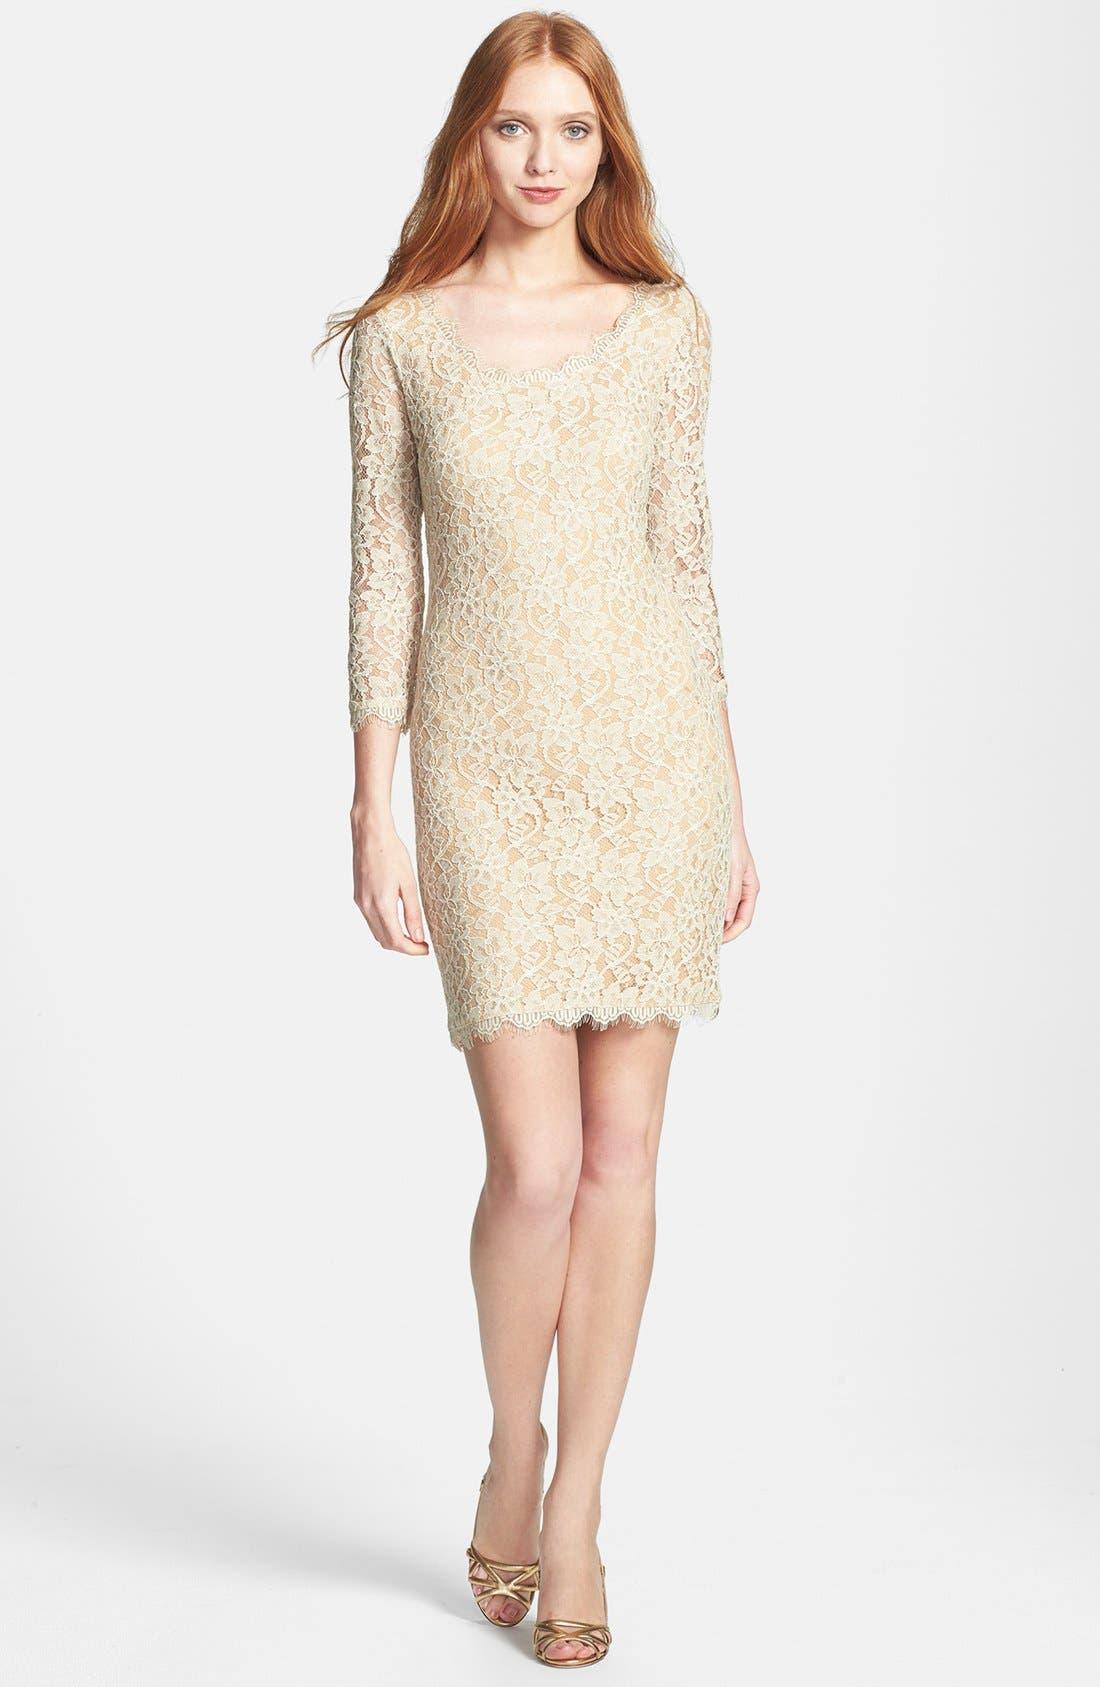 Alternate Image 1 Selected - Diane von Furstenberg 'Zarita' Lace Scoop Dress